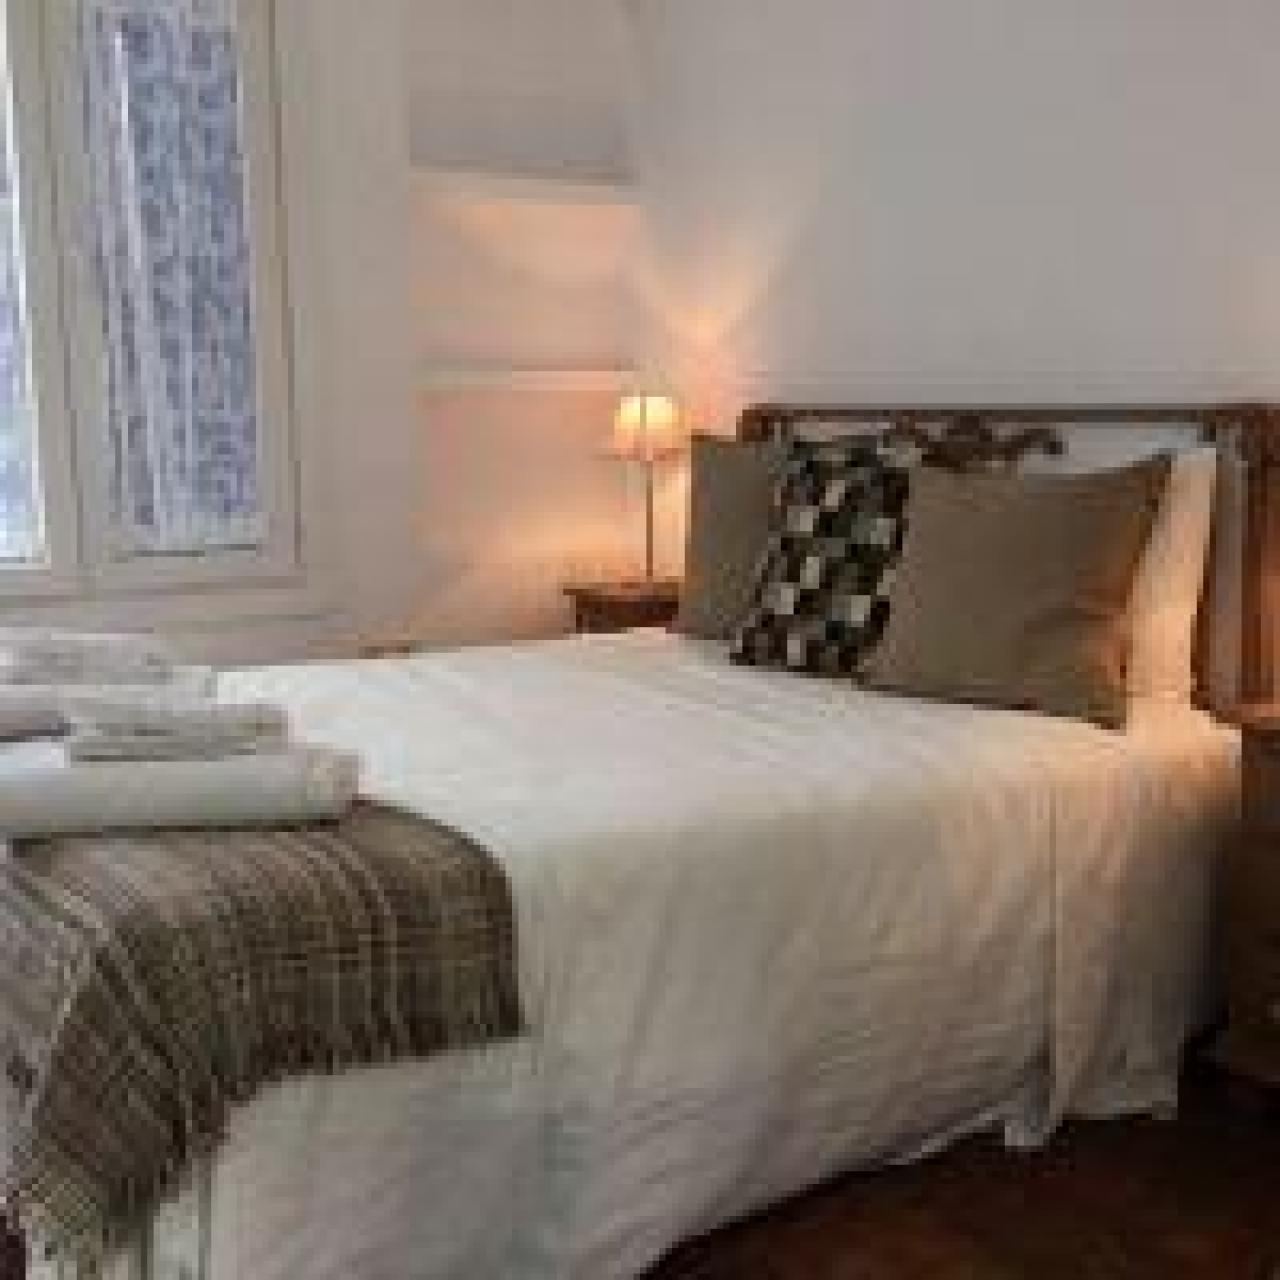 Habitaciones en alquiler Villaluenga de la Sagra, Toledo